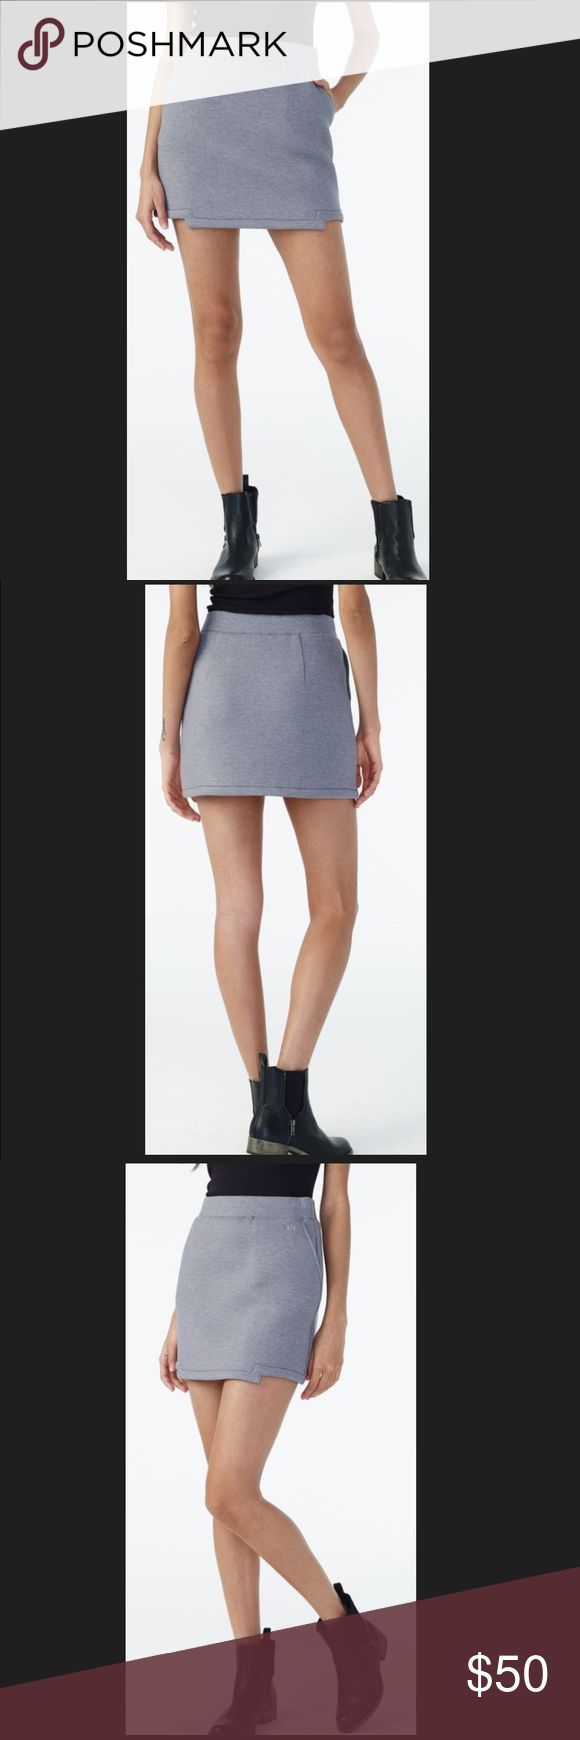 "ARMANI EXCHANGE KNIT GEO - HEM MINI SKIRT. ARMANI EXCHANGE KNIT GEO - HEM MINI SKIRT.          Size : Small Approx 15 1/2 "" A/X Armani Exchange Skirts Mini"